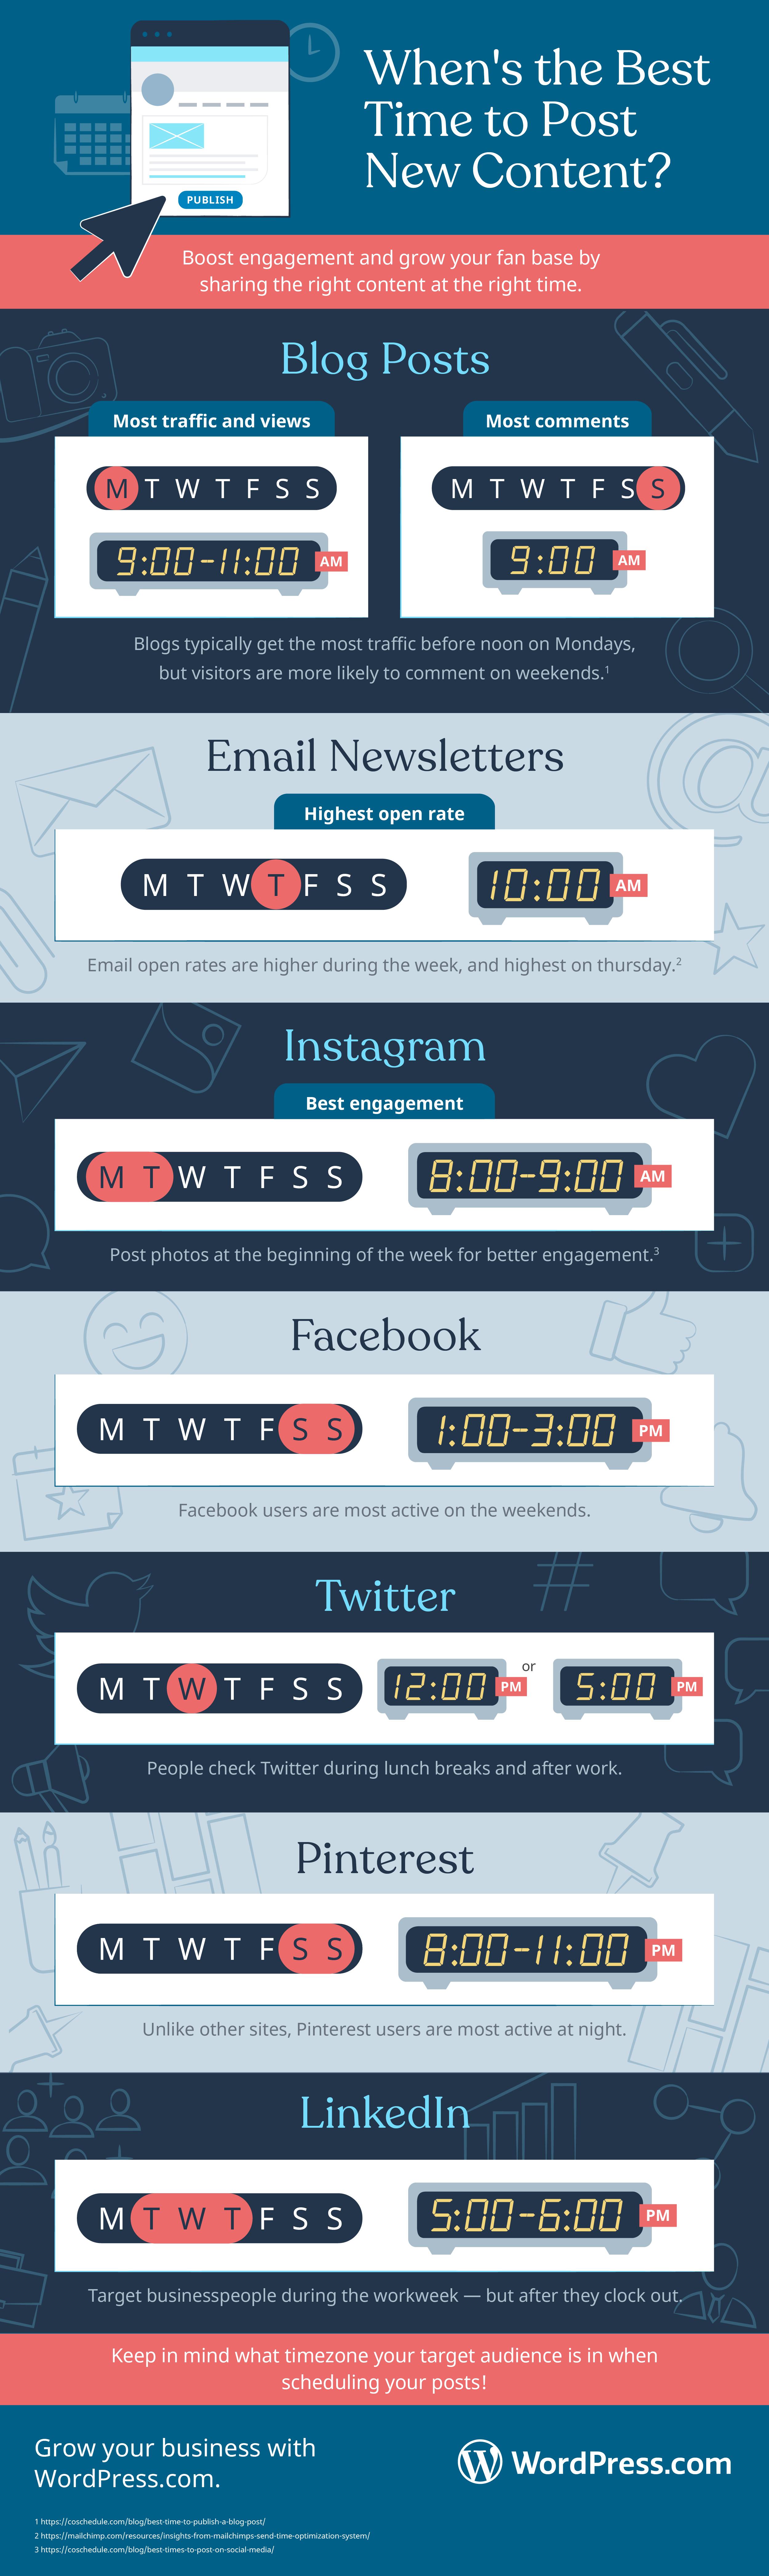 content schedule infographic